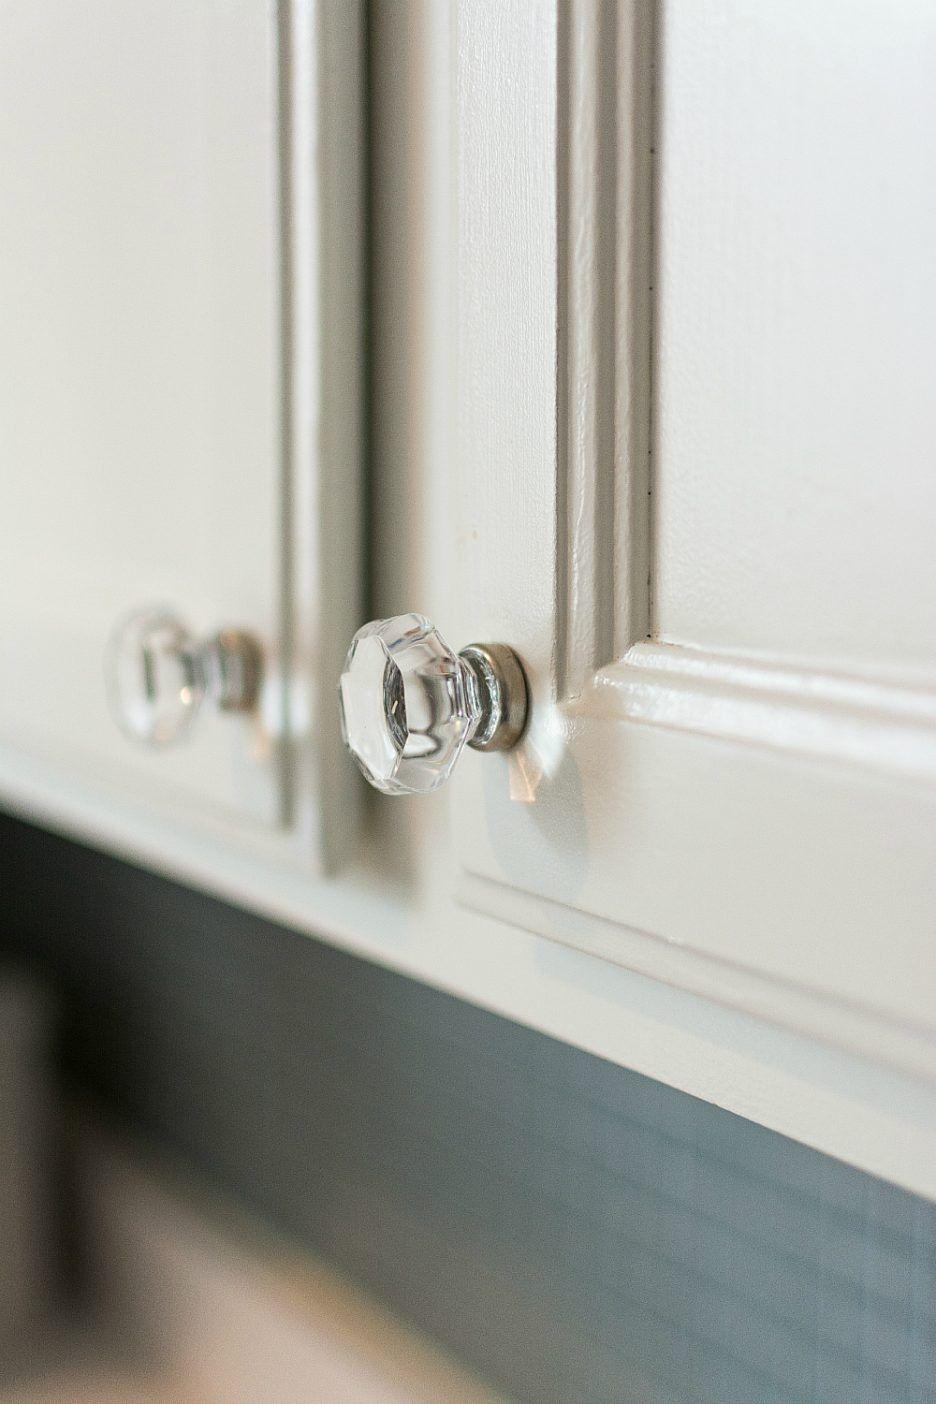 Pin by rahayu12 on interior analogi | Pinterest | Cupboard ideas ...